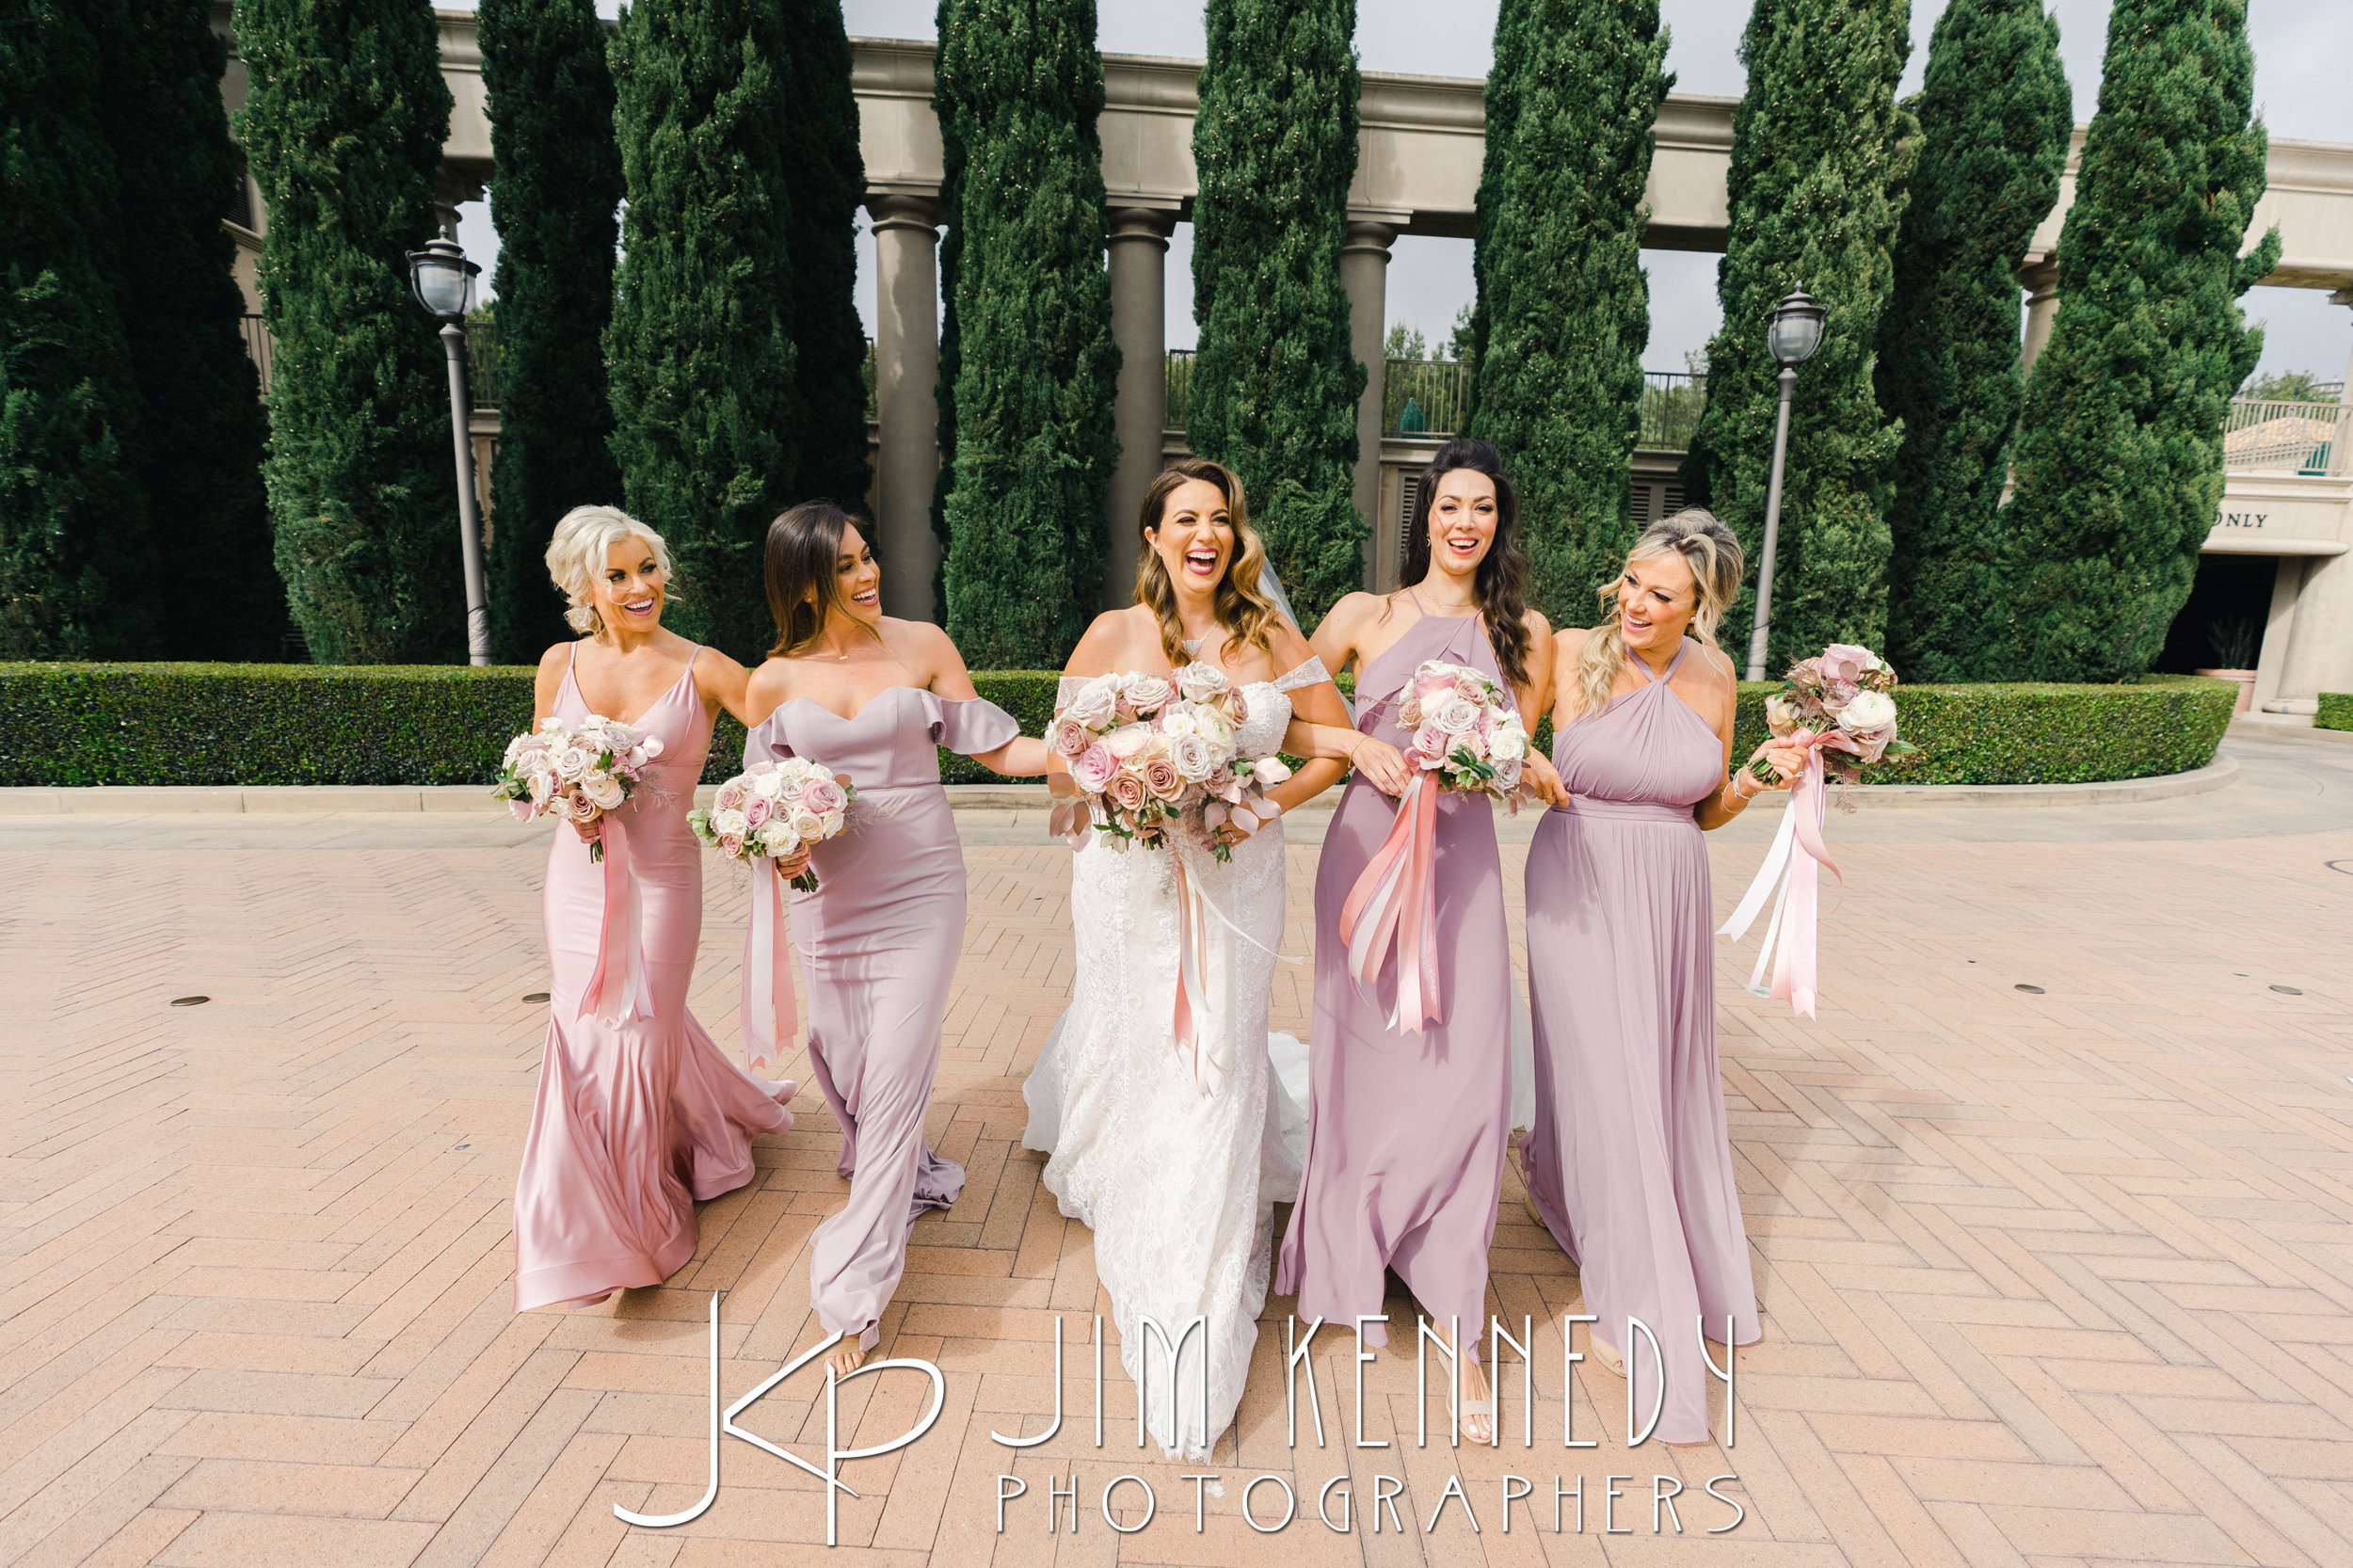 pelican-hill-wedding-jim-kenedy-photographers_0056.JPG